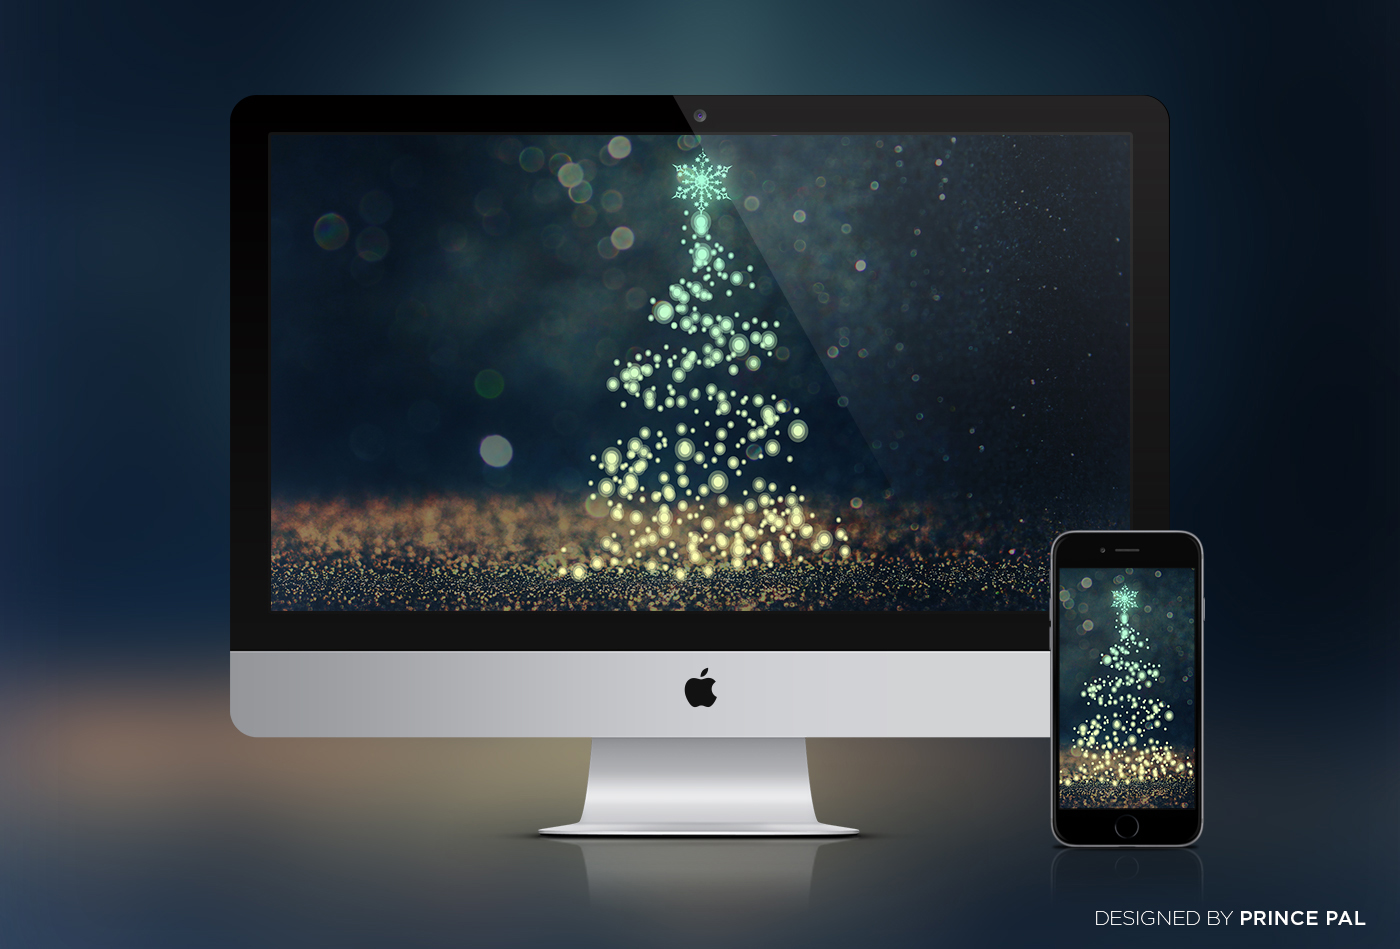 Christmas Wallpaper 2014 By Prince Pal